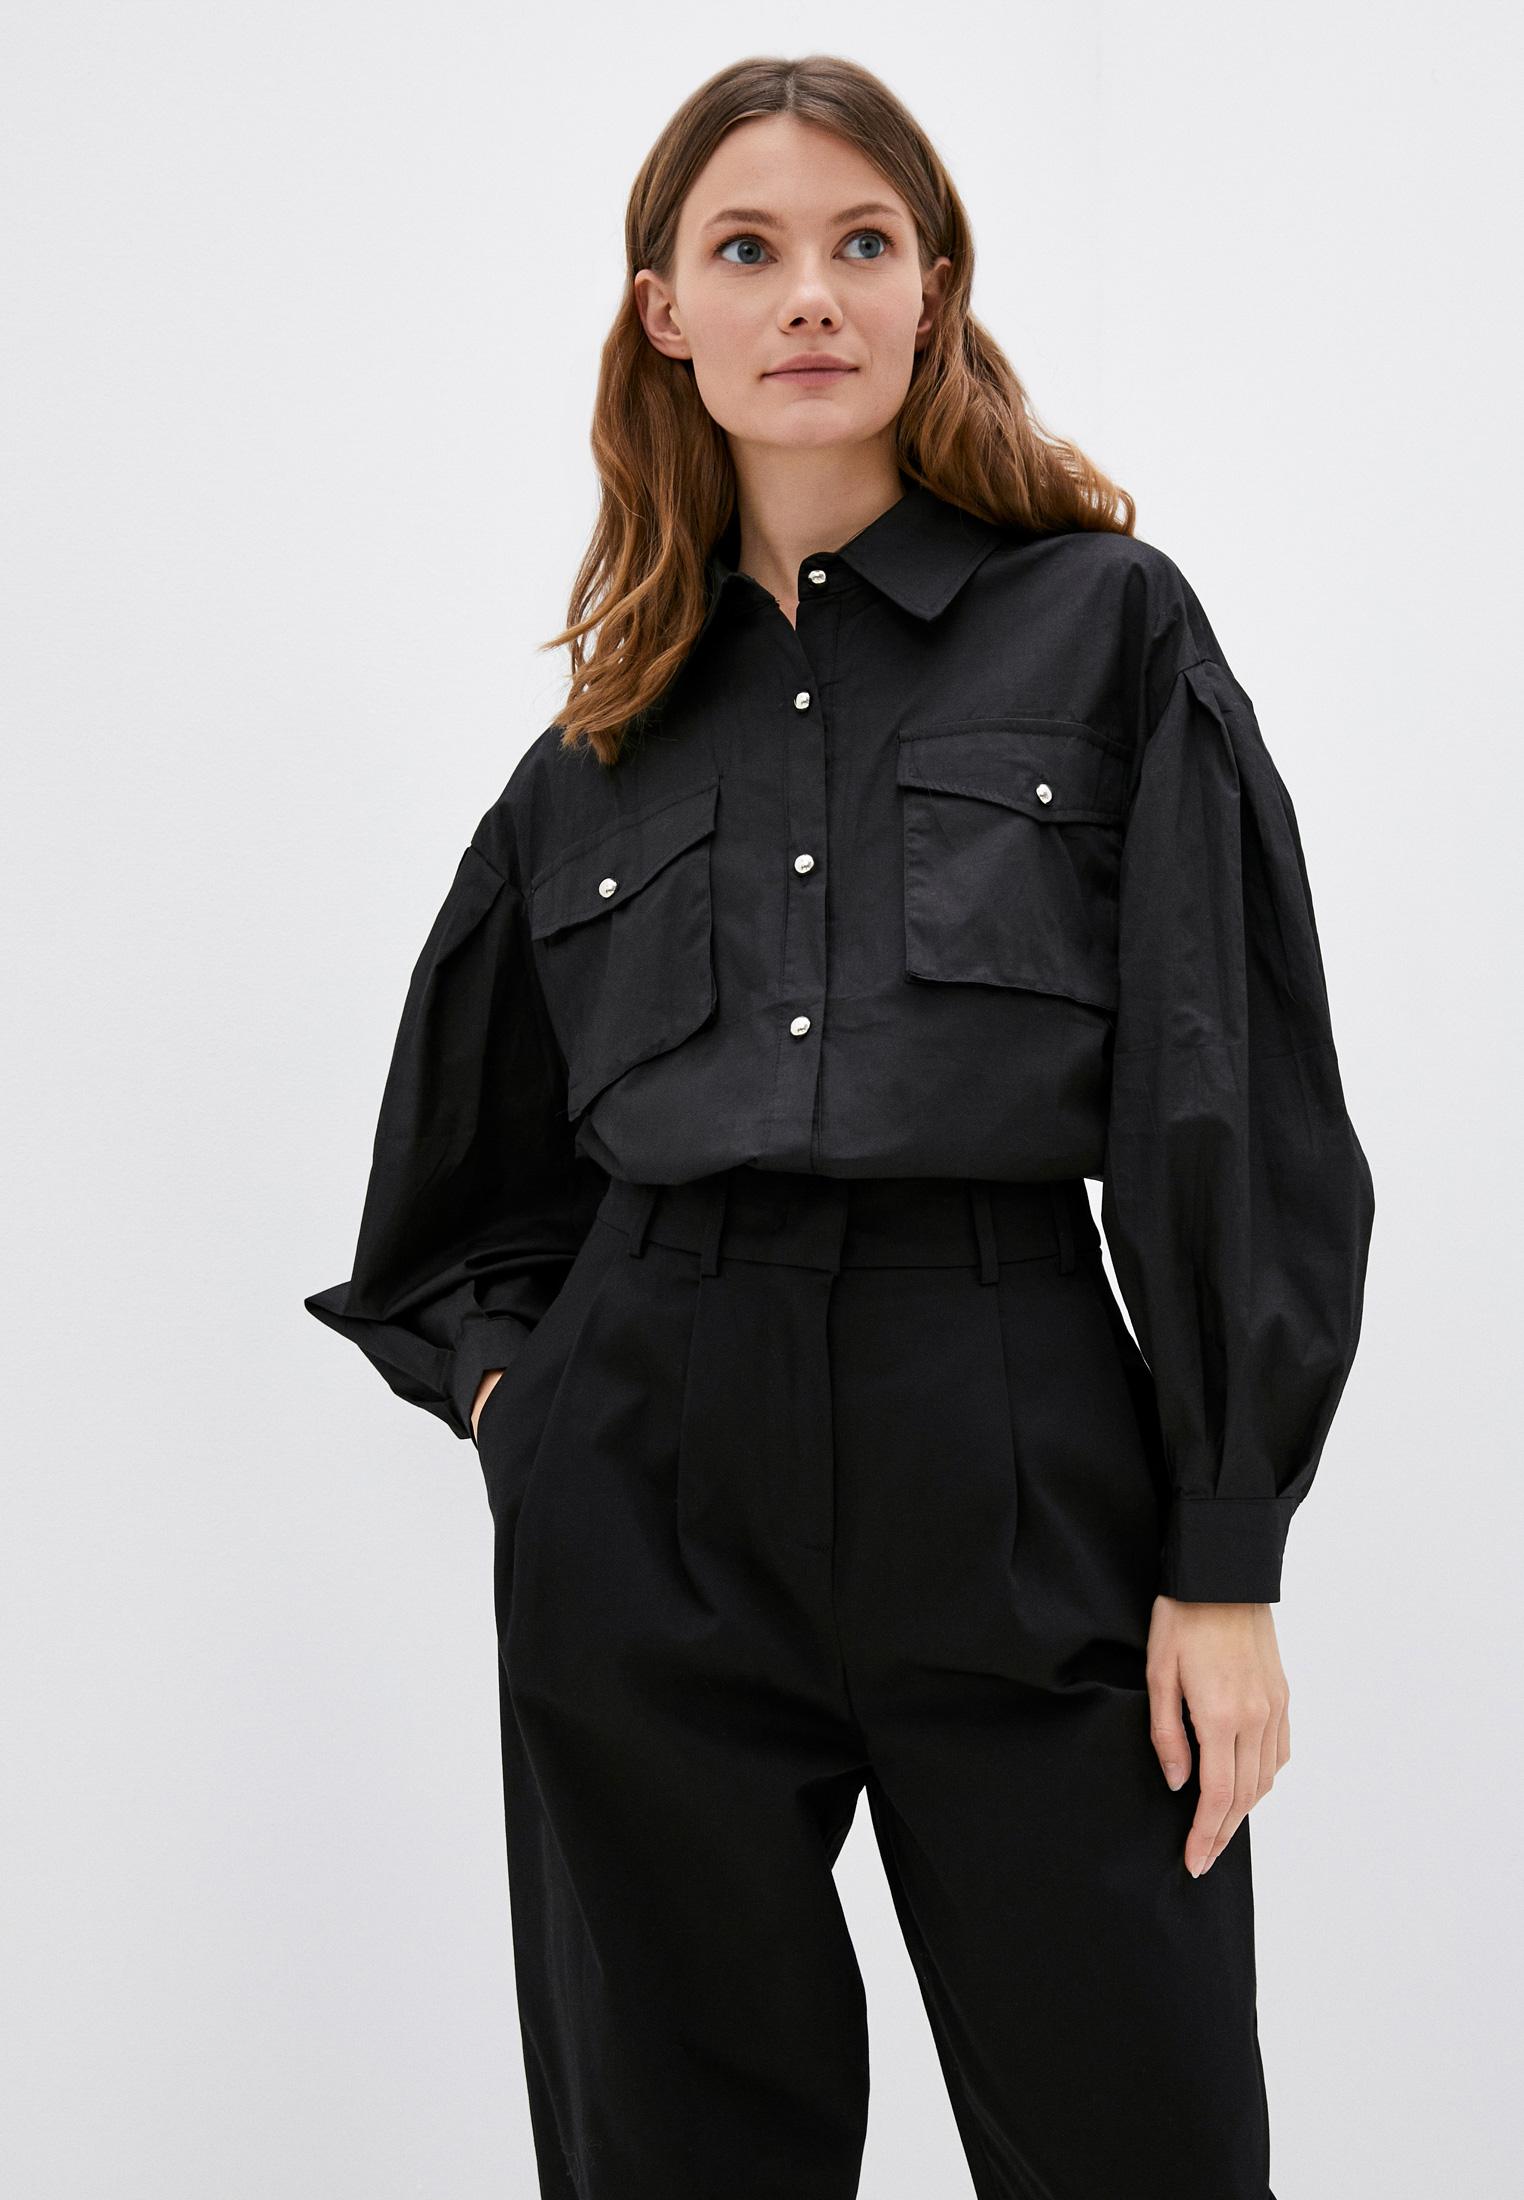 Женские рубашки с длинным рукавом Miss Gabby Рубашка Miss Gabby